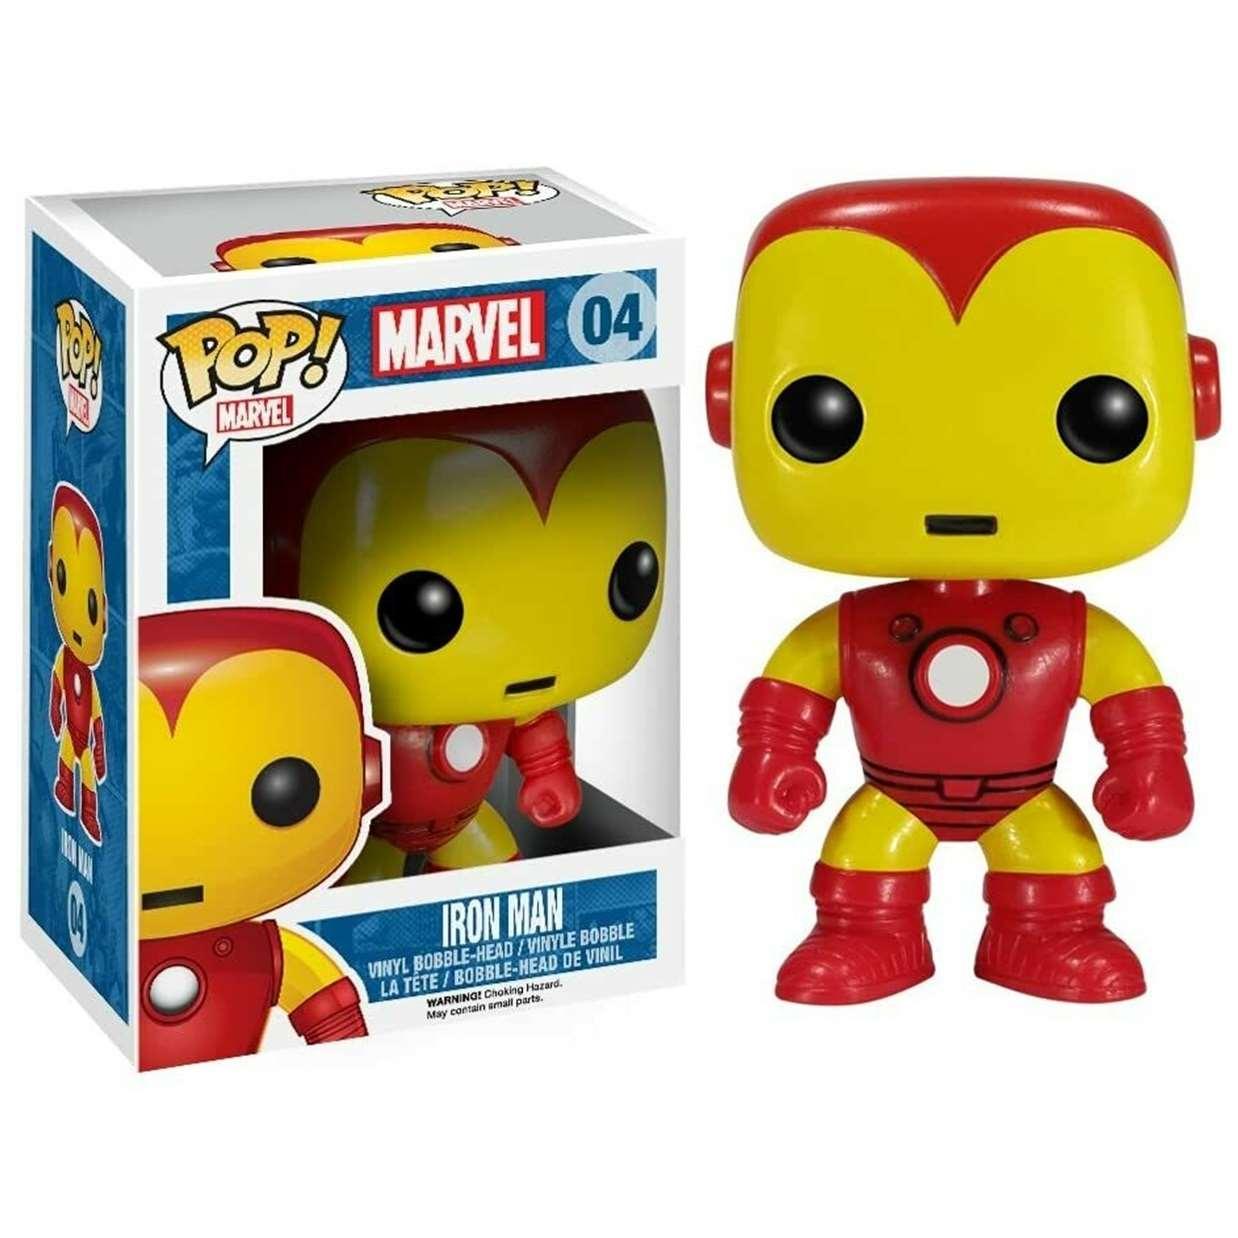 Iron Man #04 Figura Marvel Funko Pop!